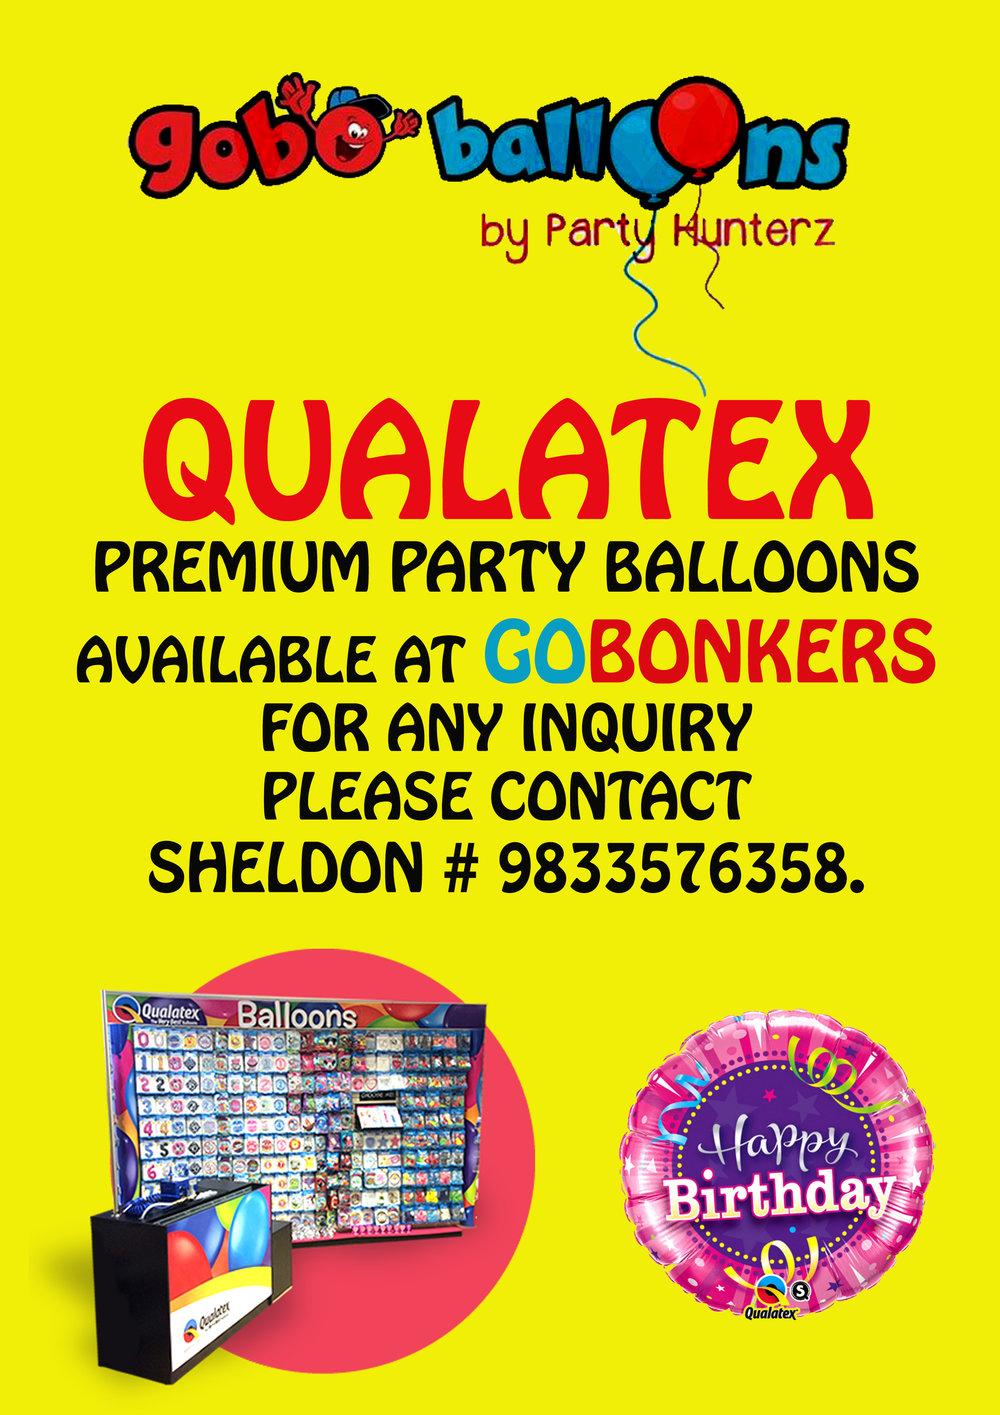 Qualatex copy.jpg